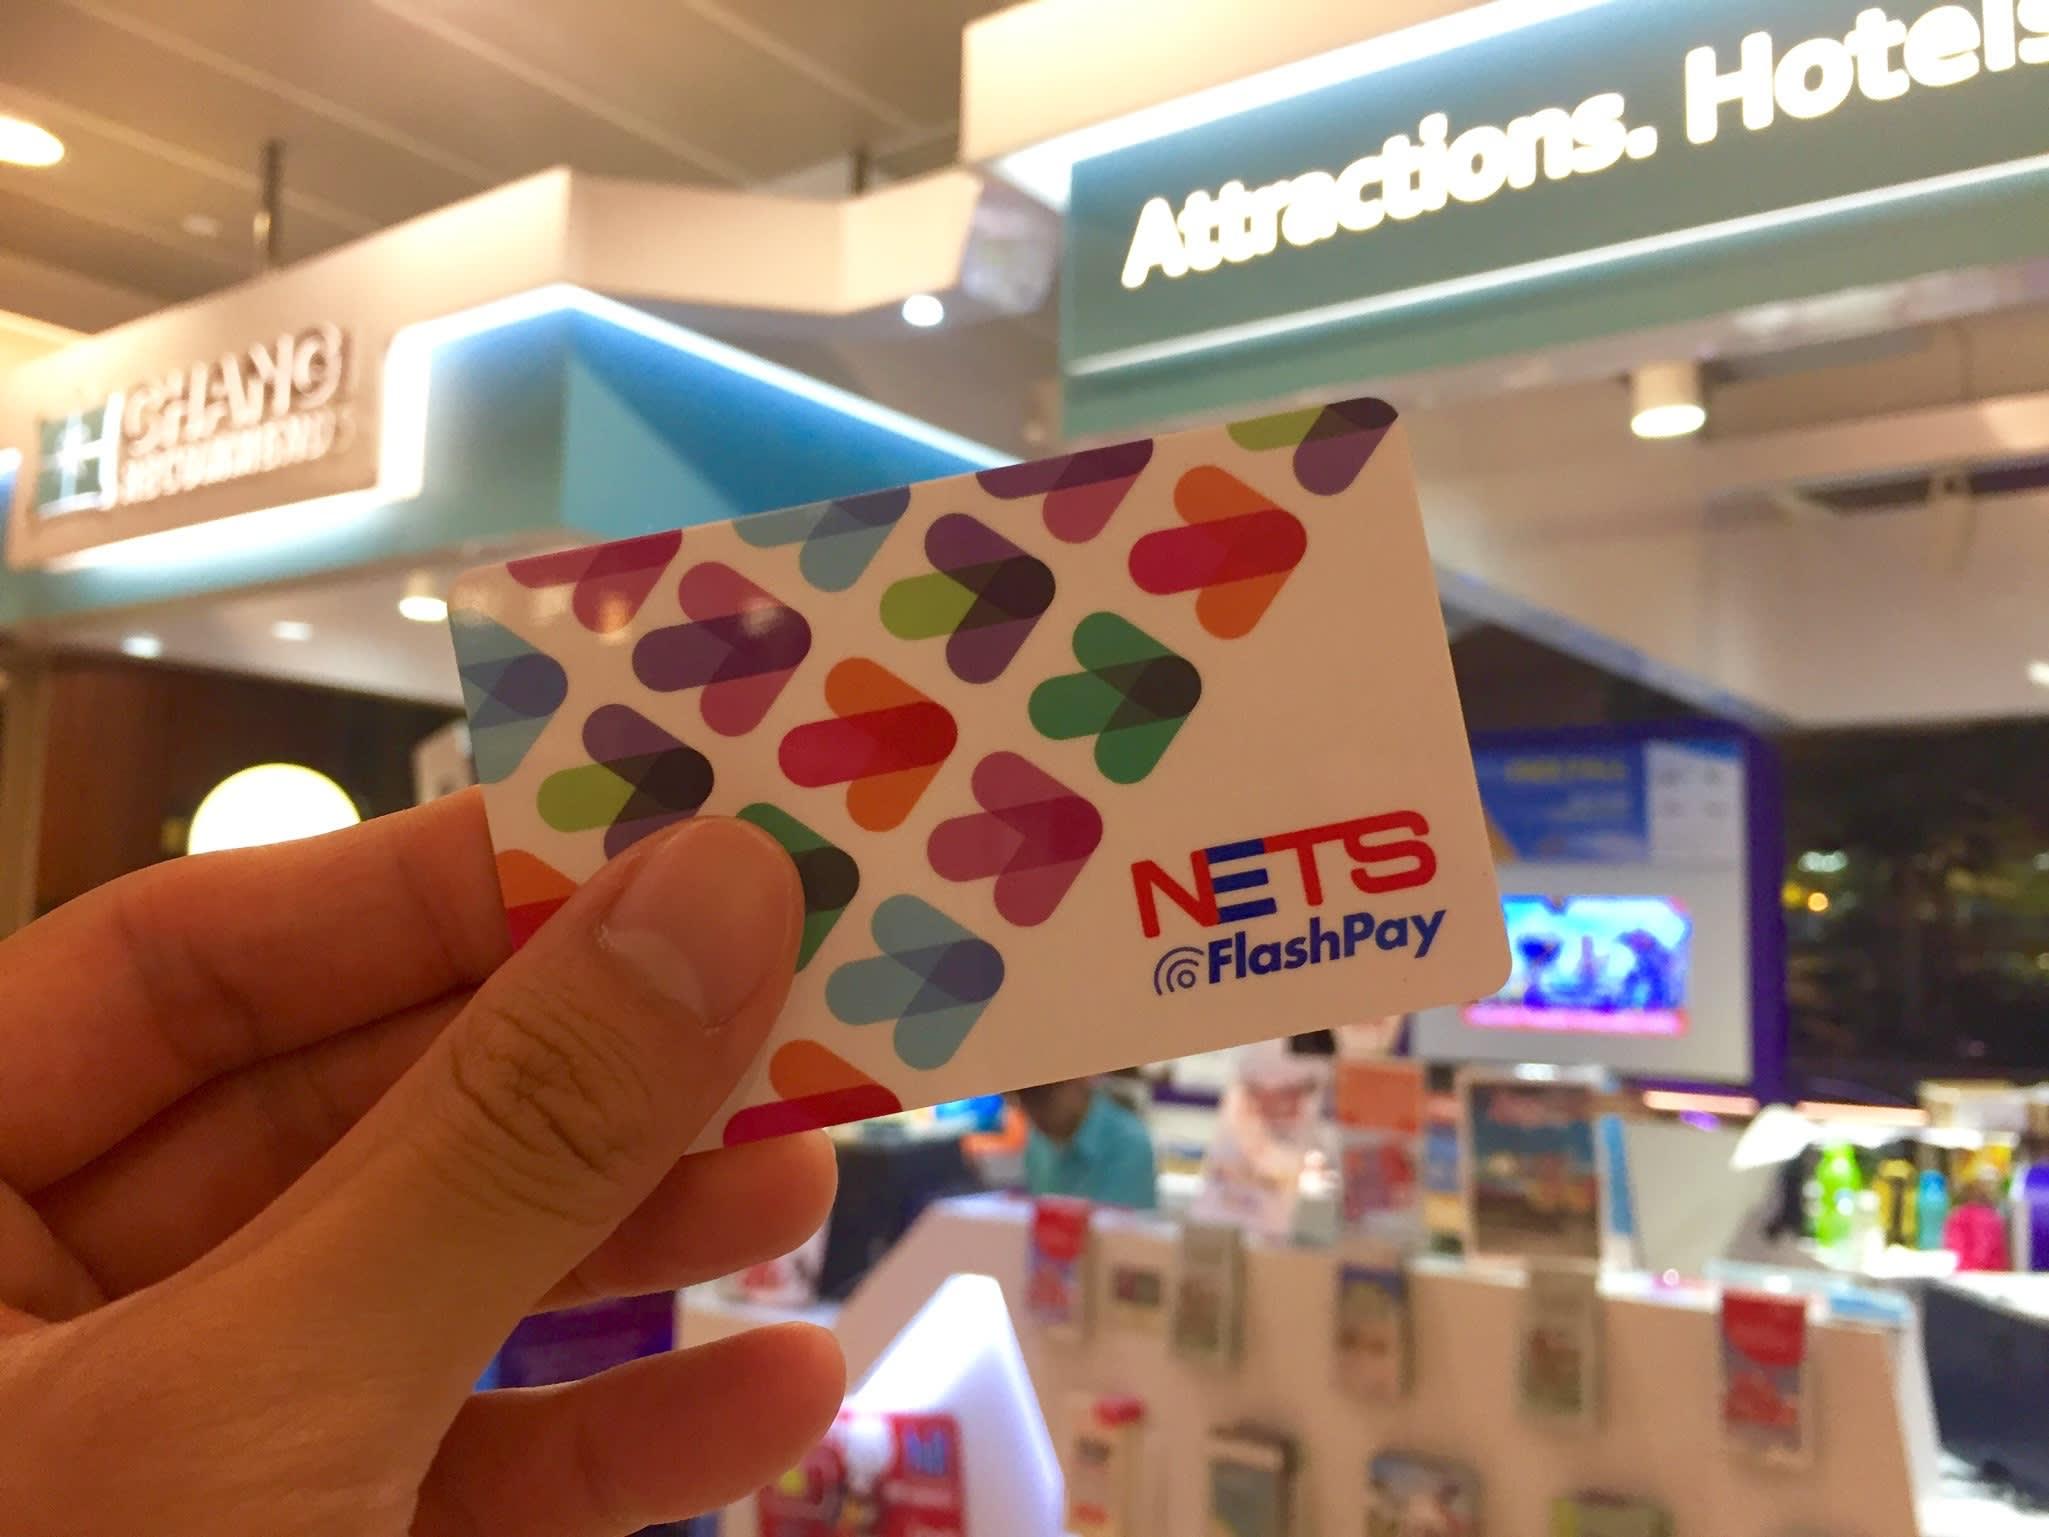 FlashPay 新 加 坡 悠 遊 卡 。